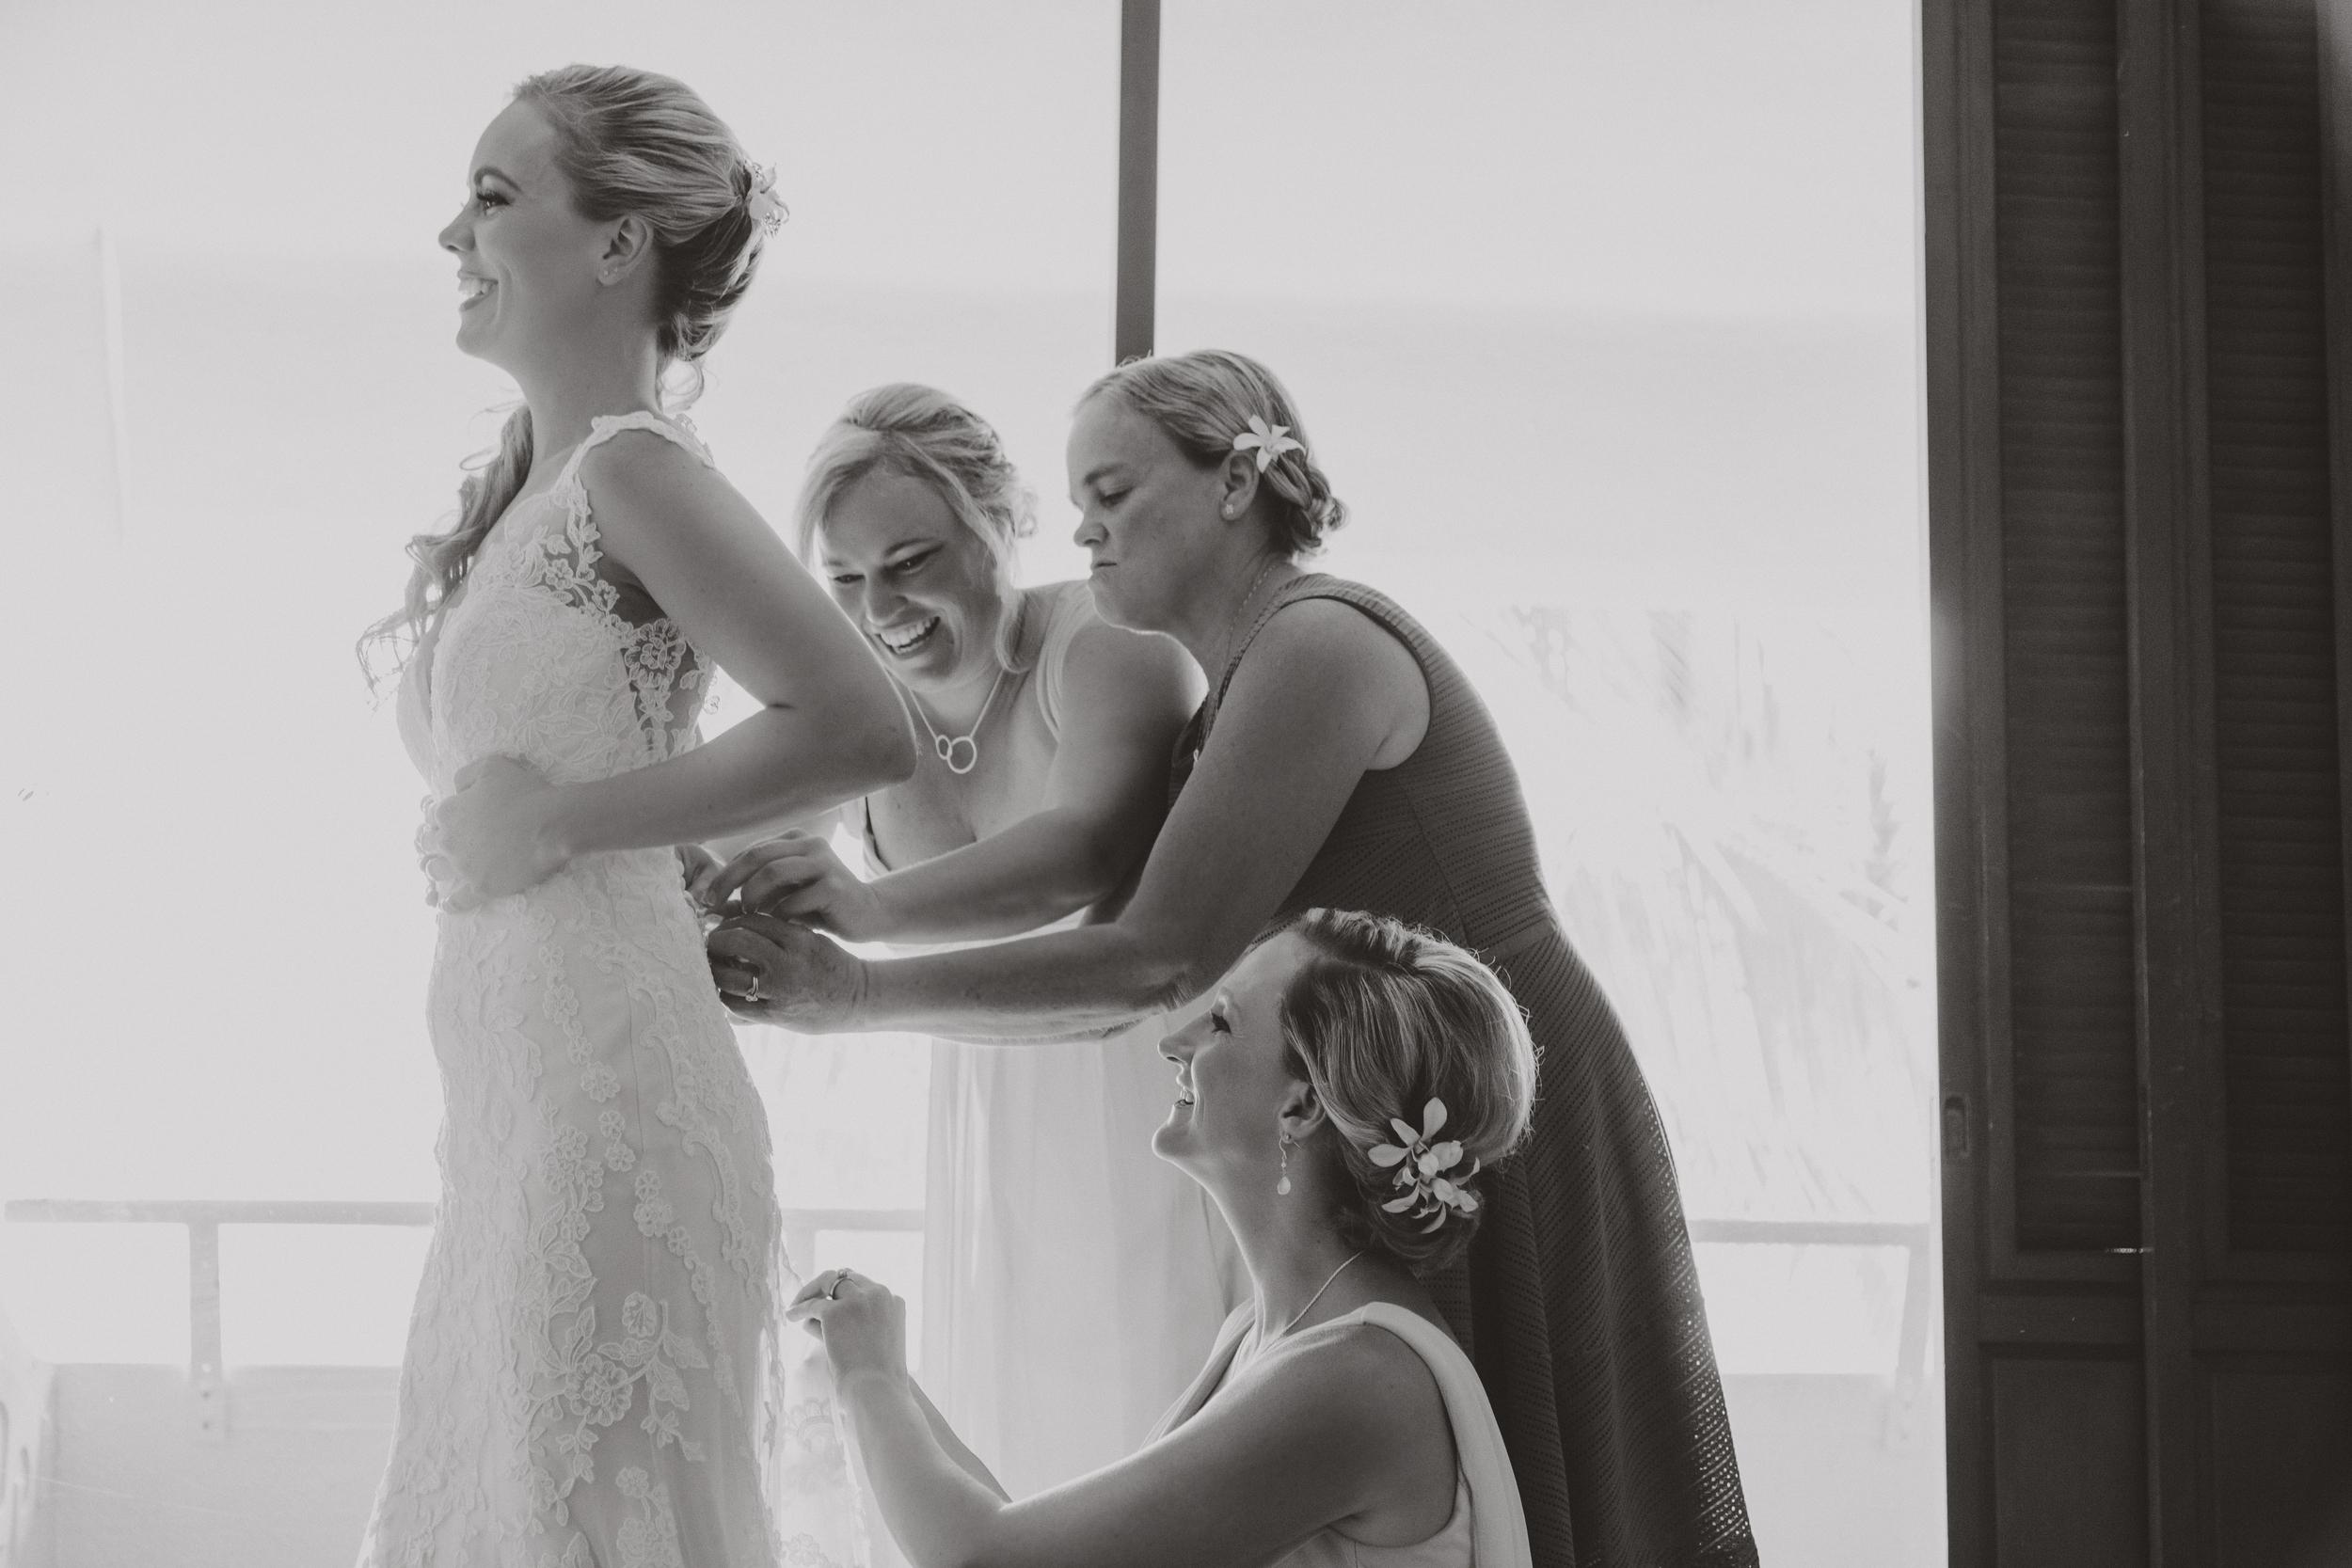 angie-diaz-photography-hawaii-wedding-photographer-kelli-jay-14.jpg